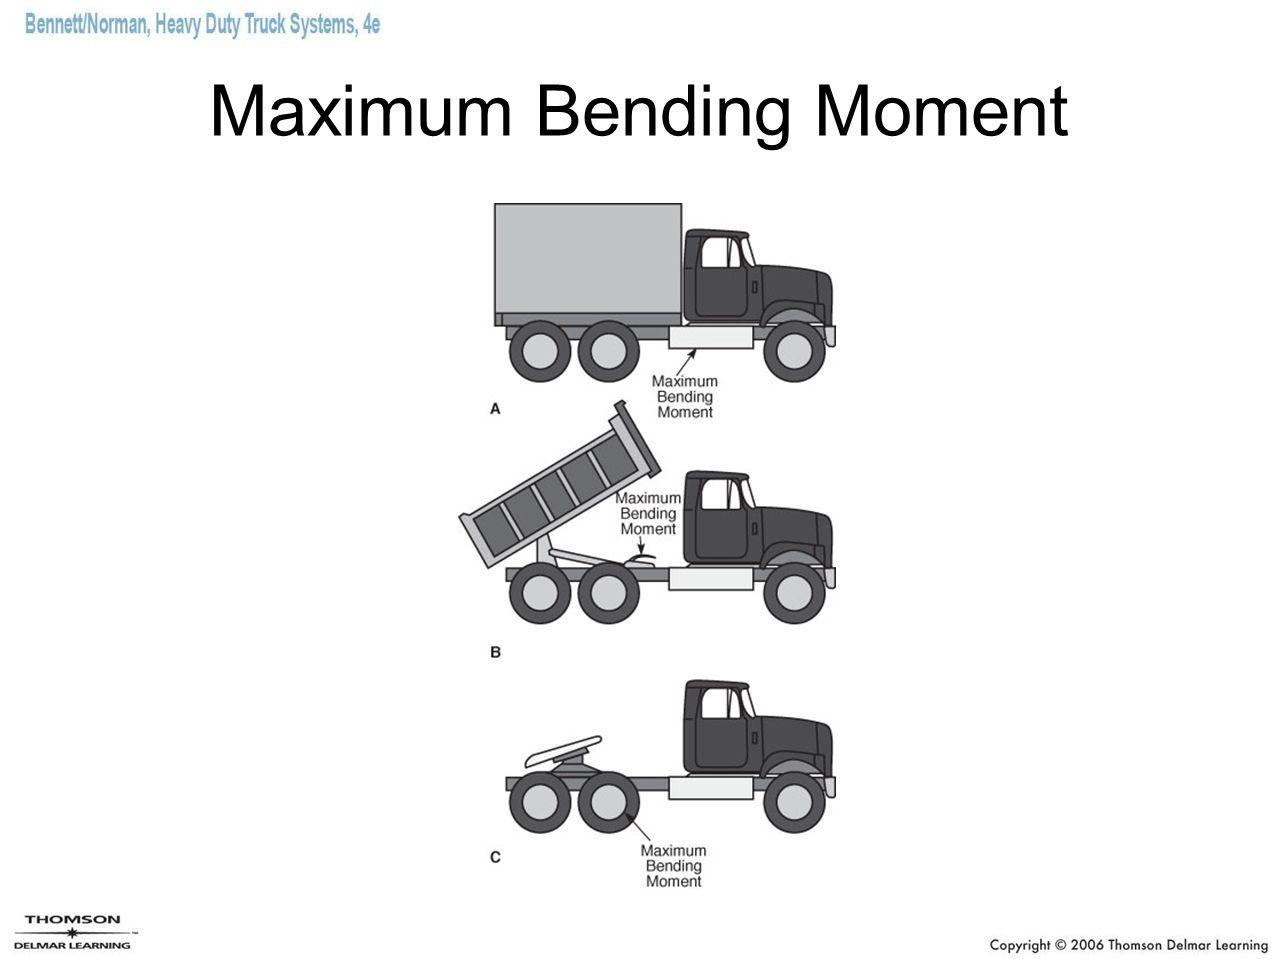 Maximum Bending Moment